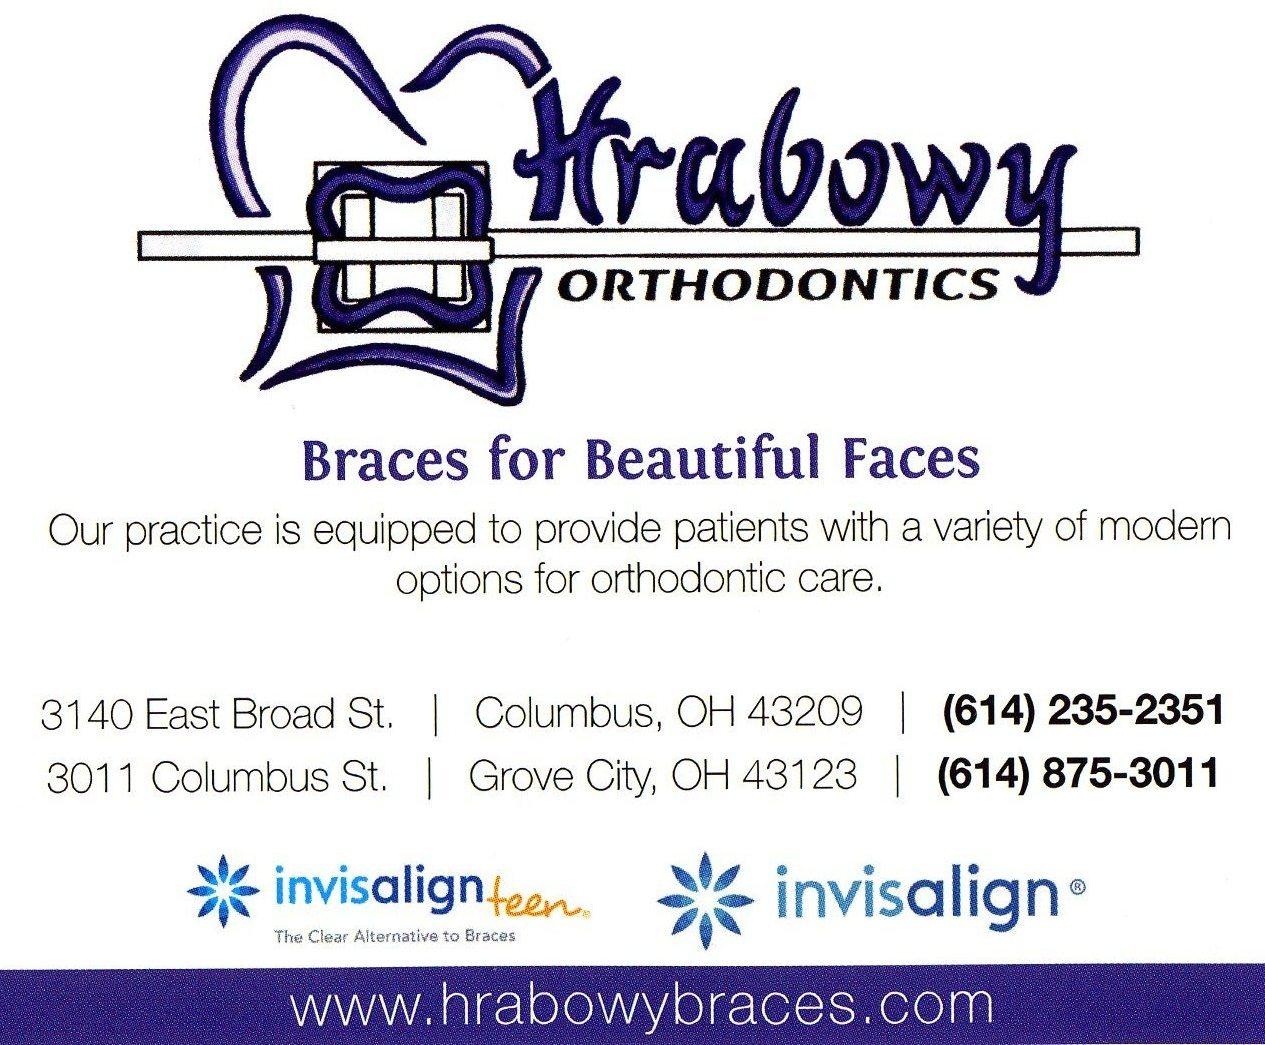 Dr. Erik Hrabowy Orthodontics image 4